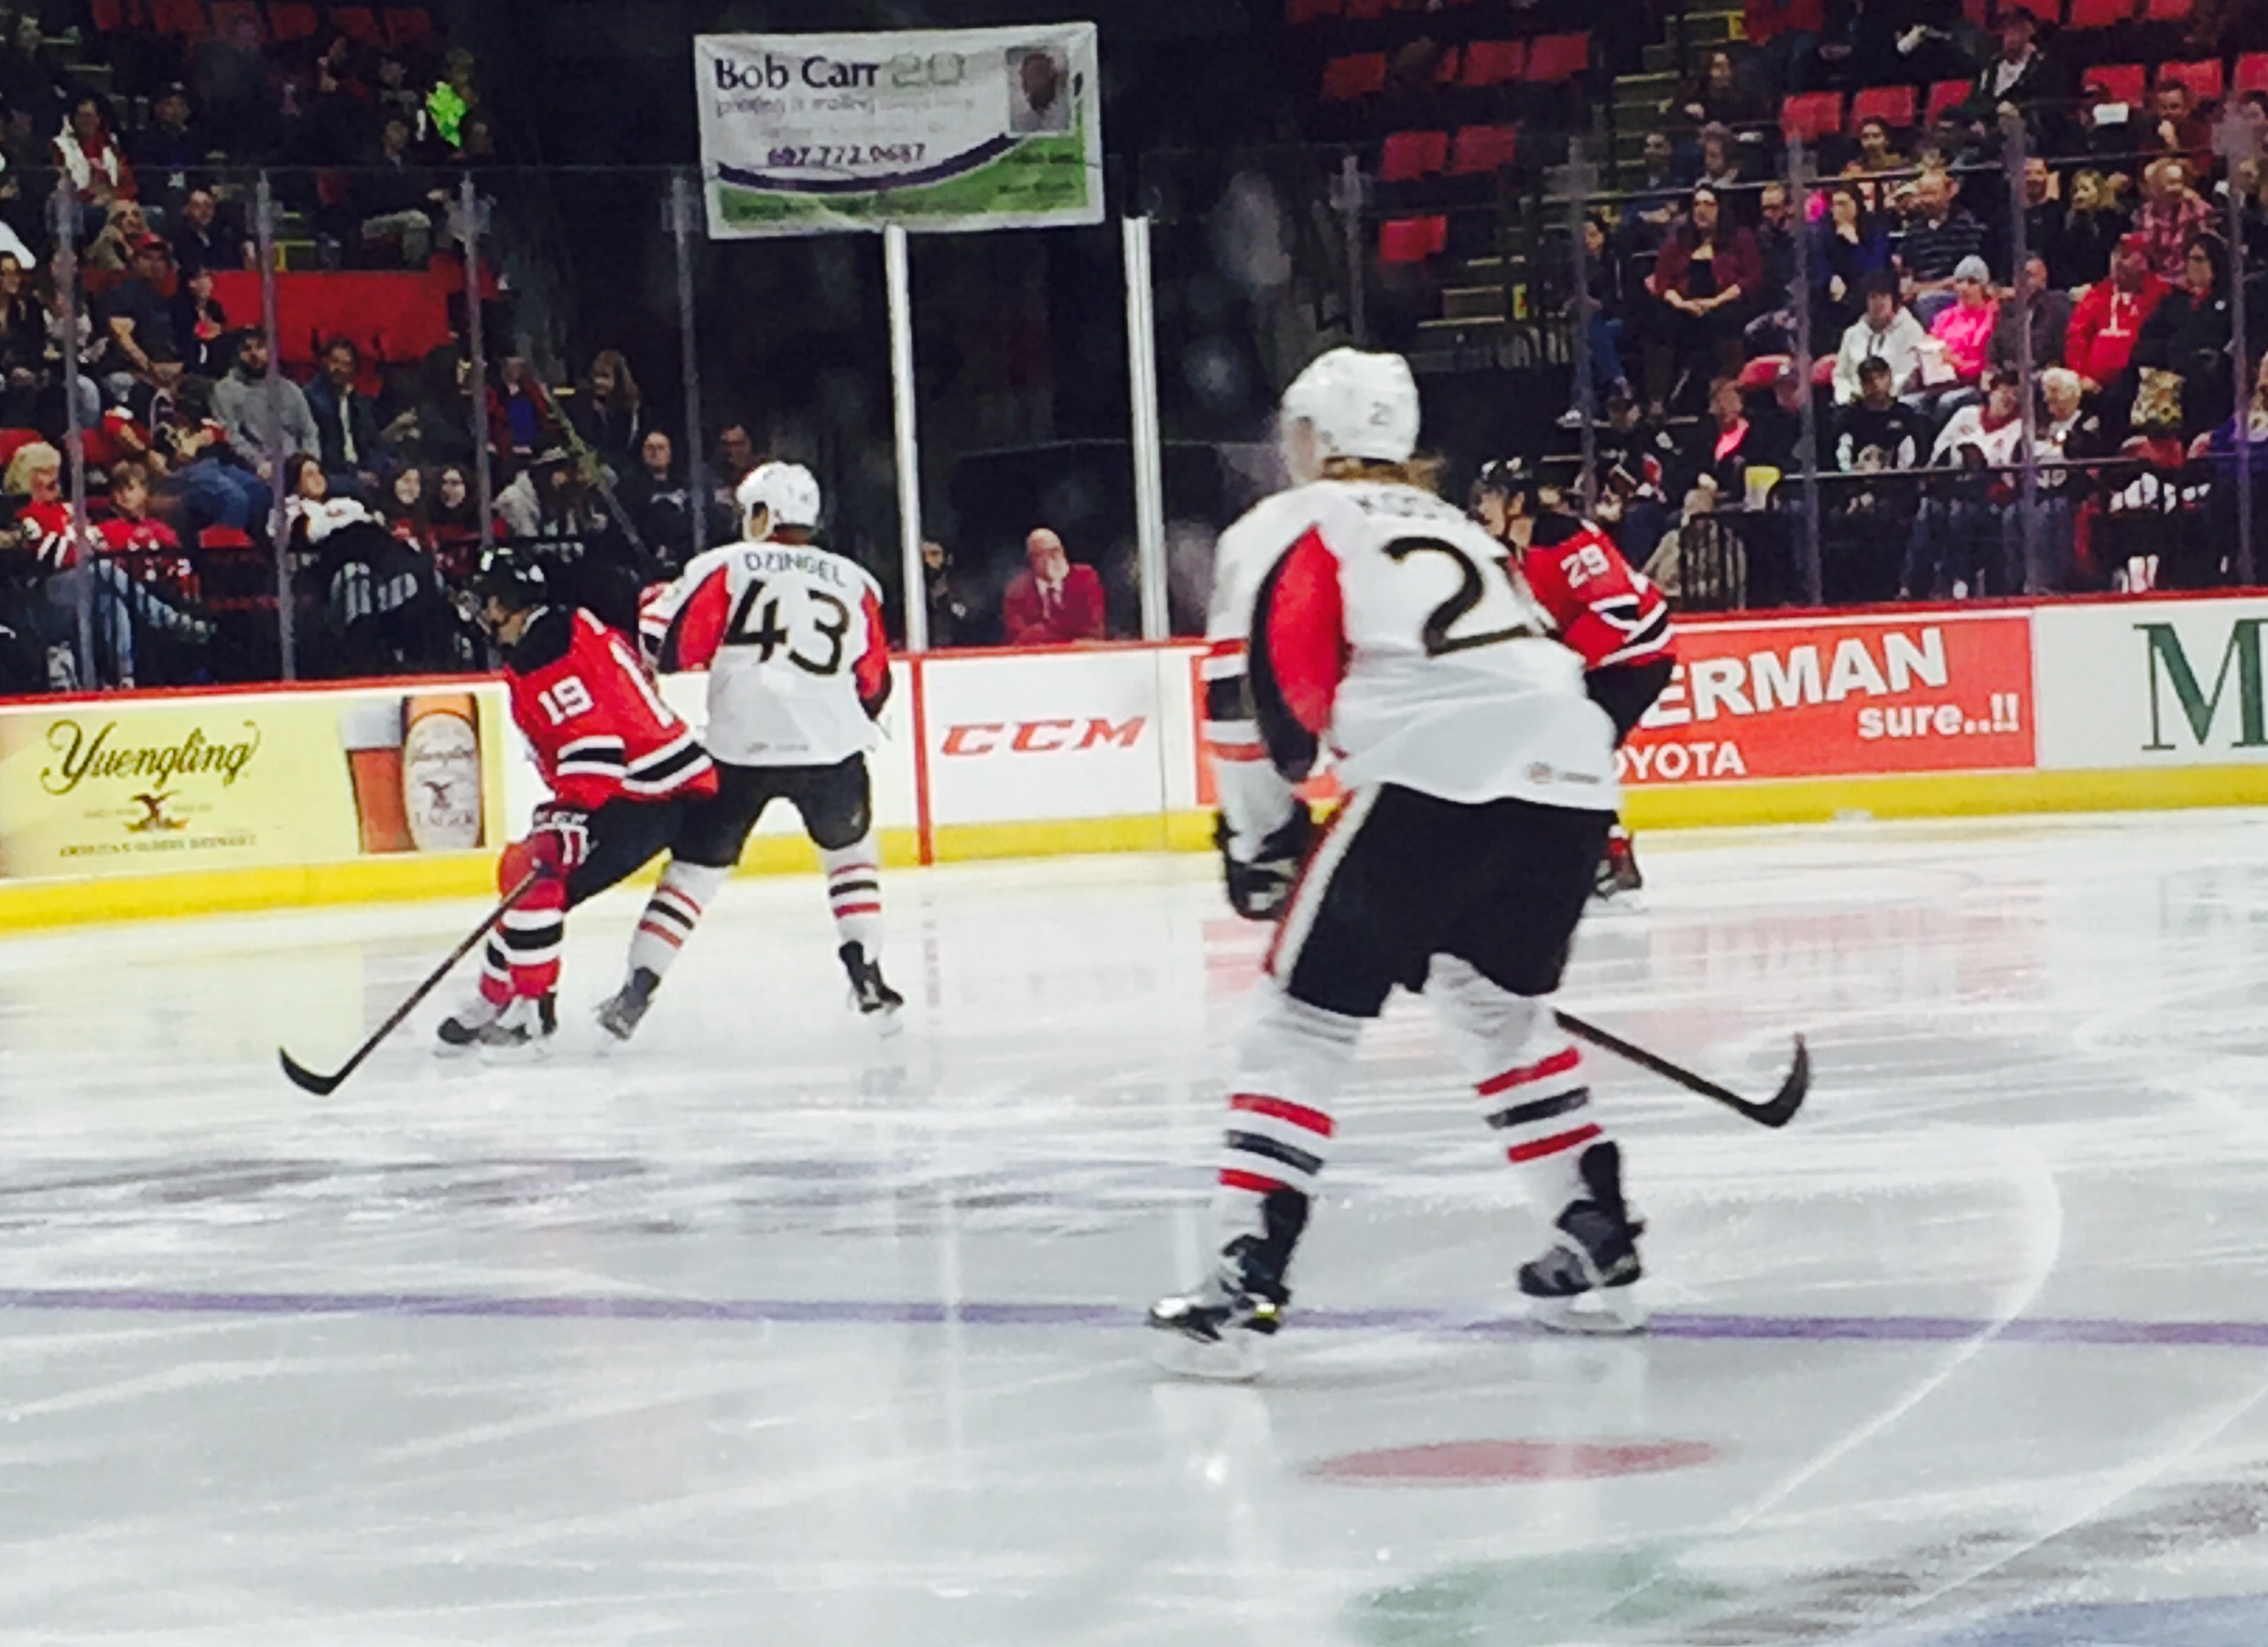 Mike Kostka and Ryan Dzingel of the Binghamton Senators defend against the Albany Devils on October 10, 2015.